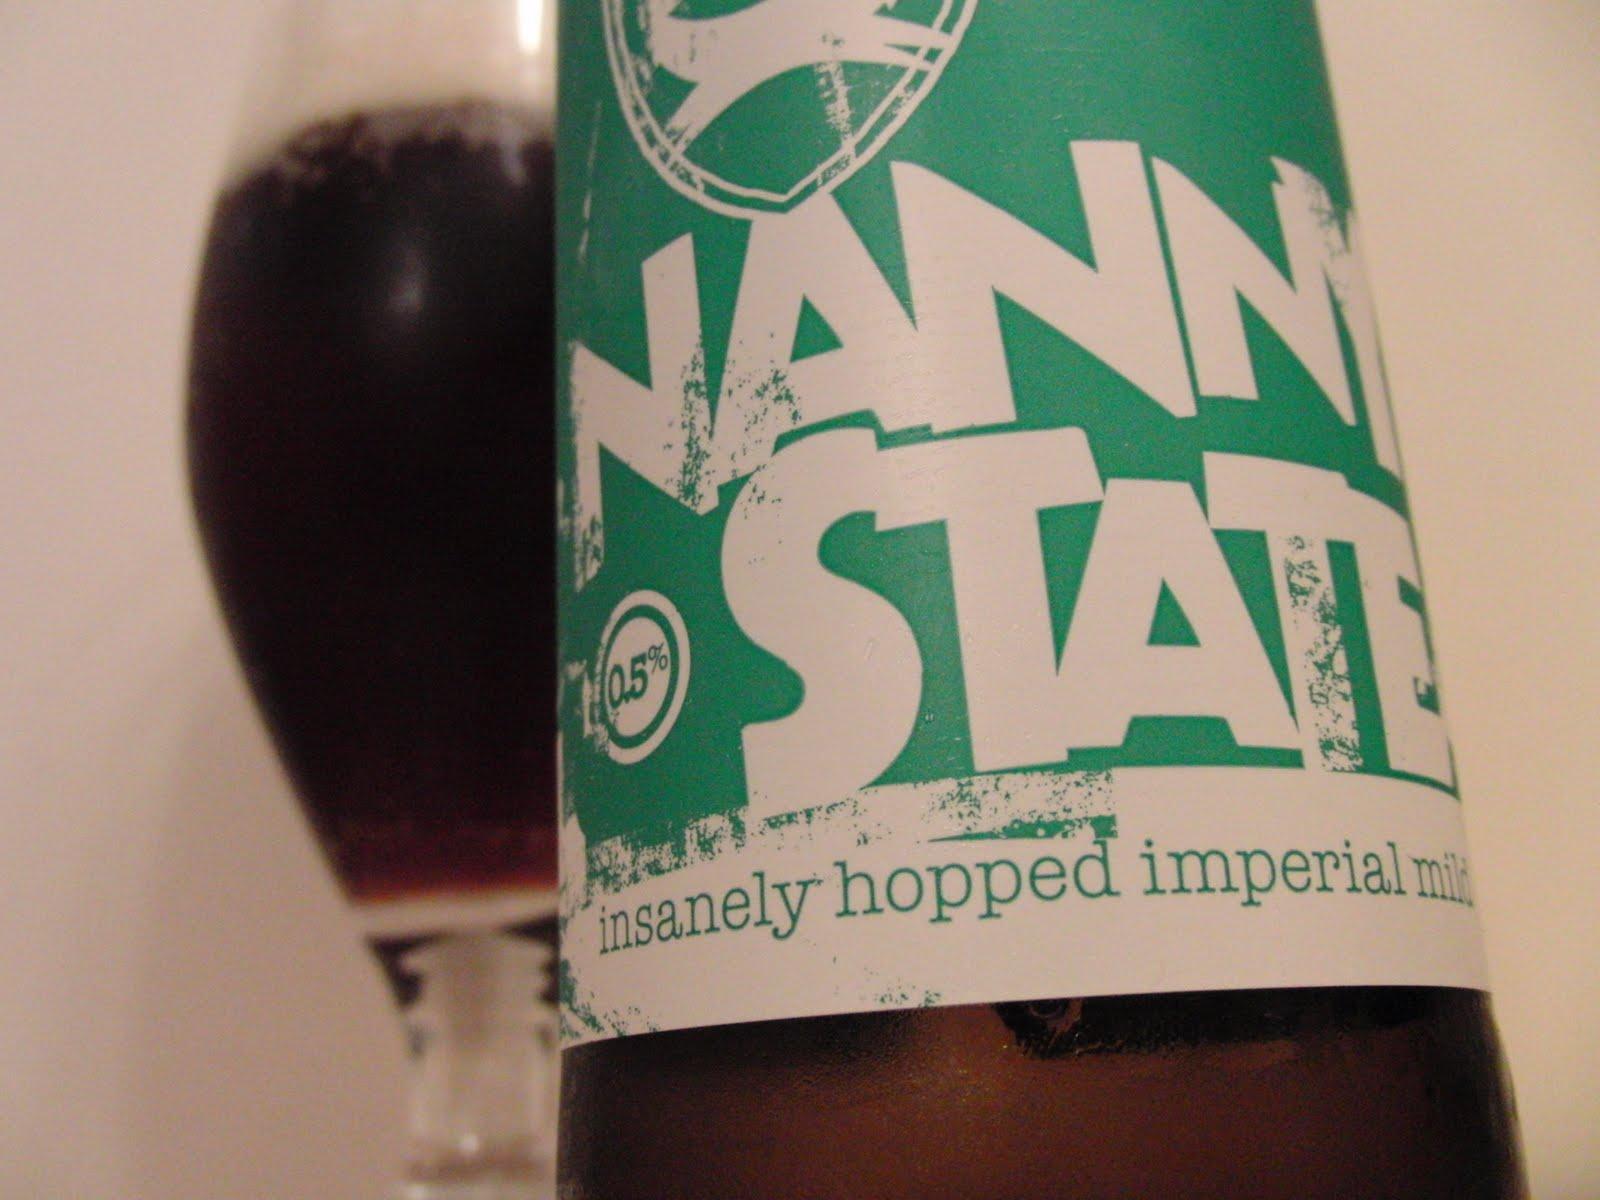 Brewdog Nanny State >> Mark Dredge - Beer: BrewDog Nanny State v0.5